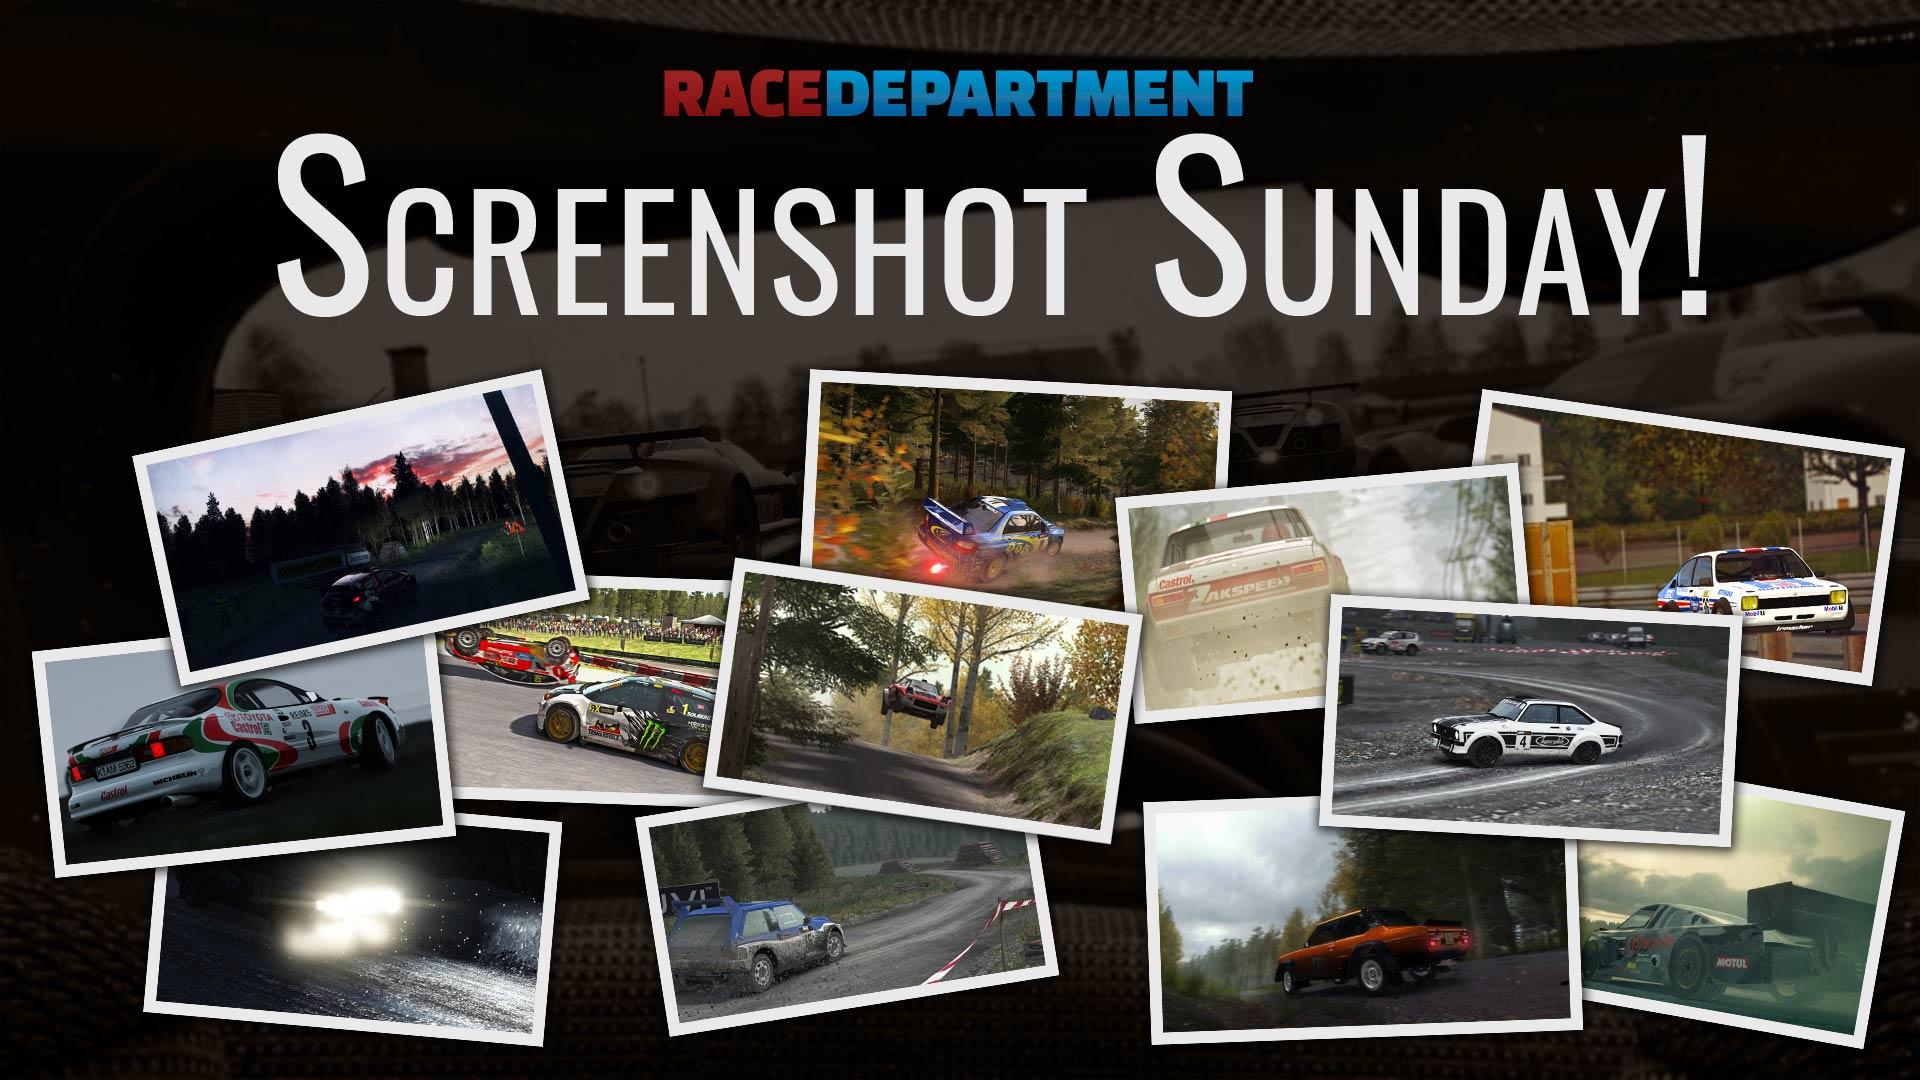 Screenshot Sunday - DiRTy Driving.jpg